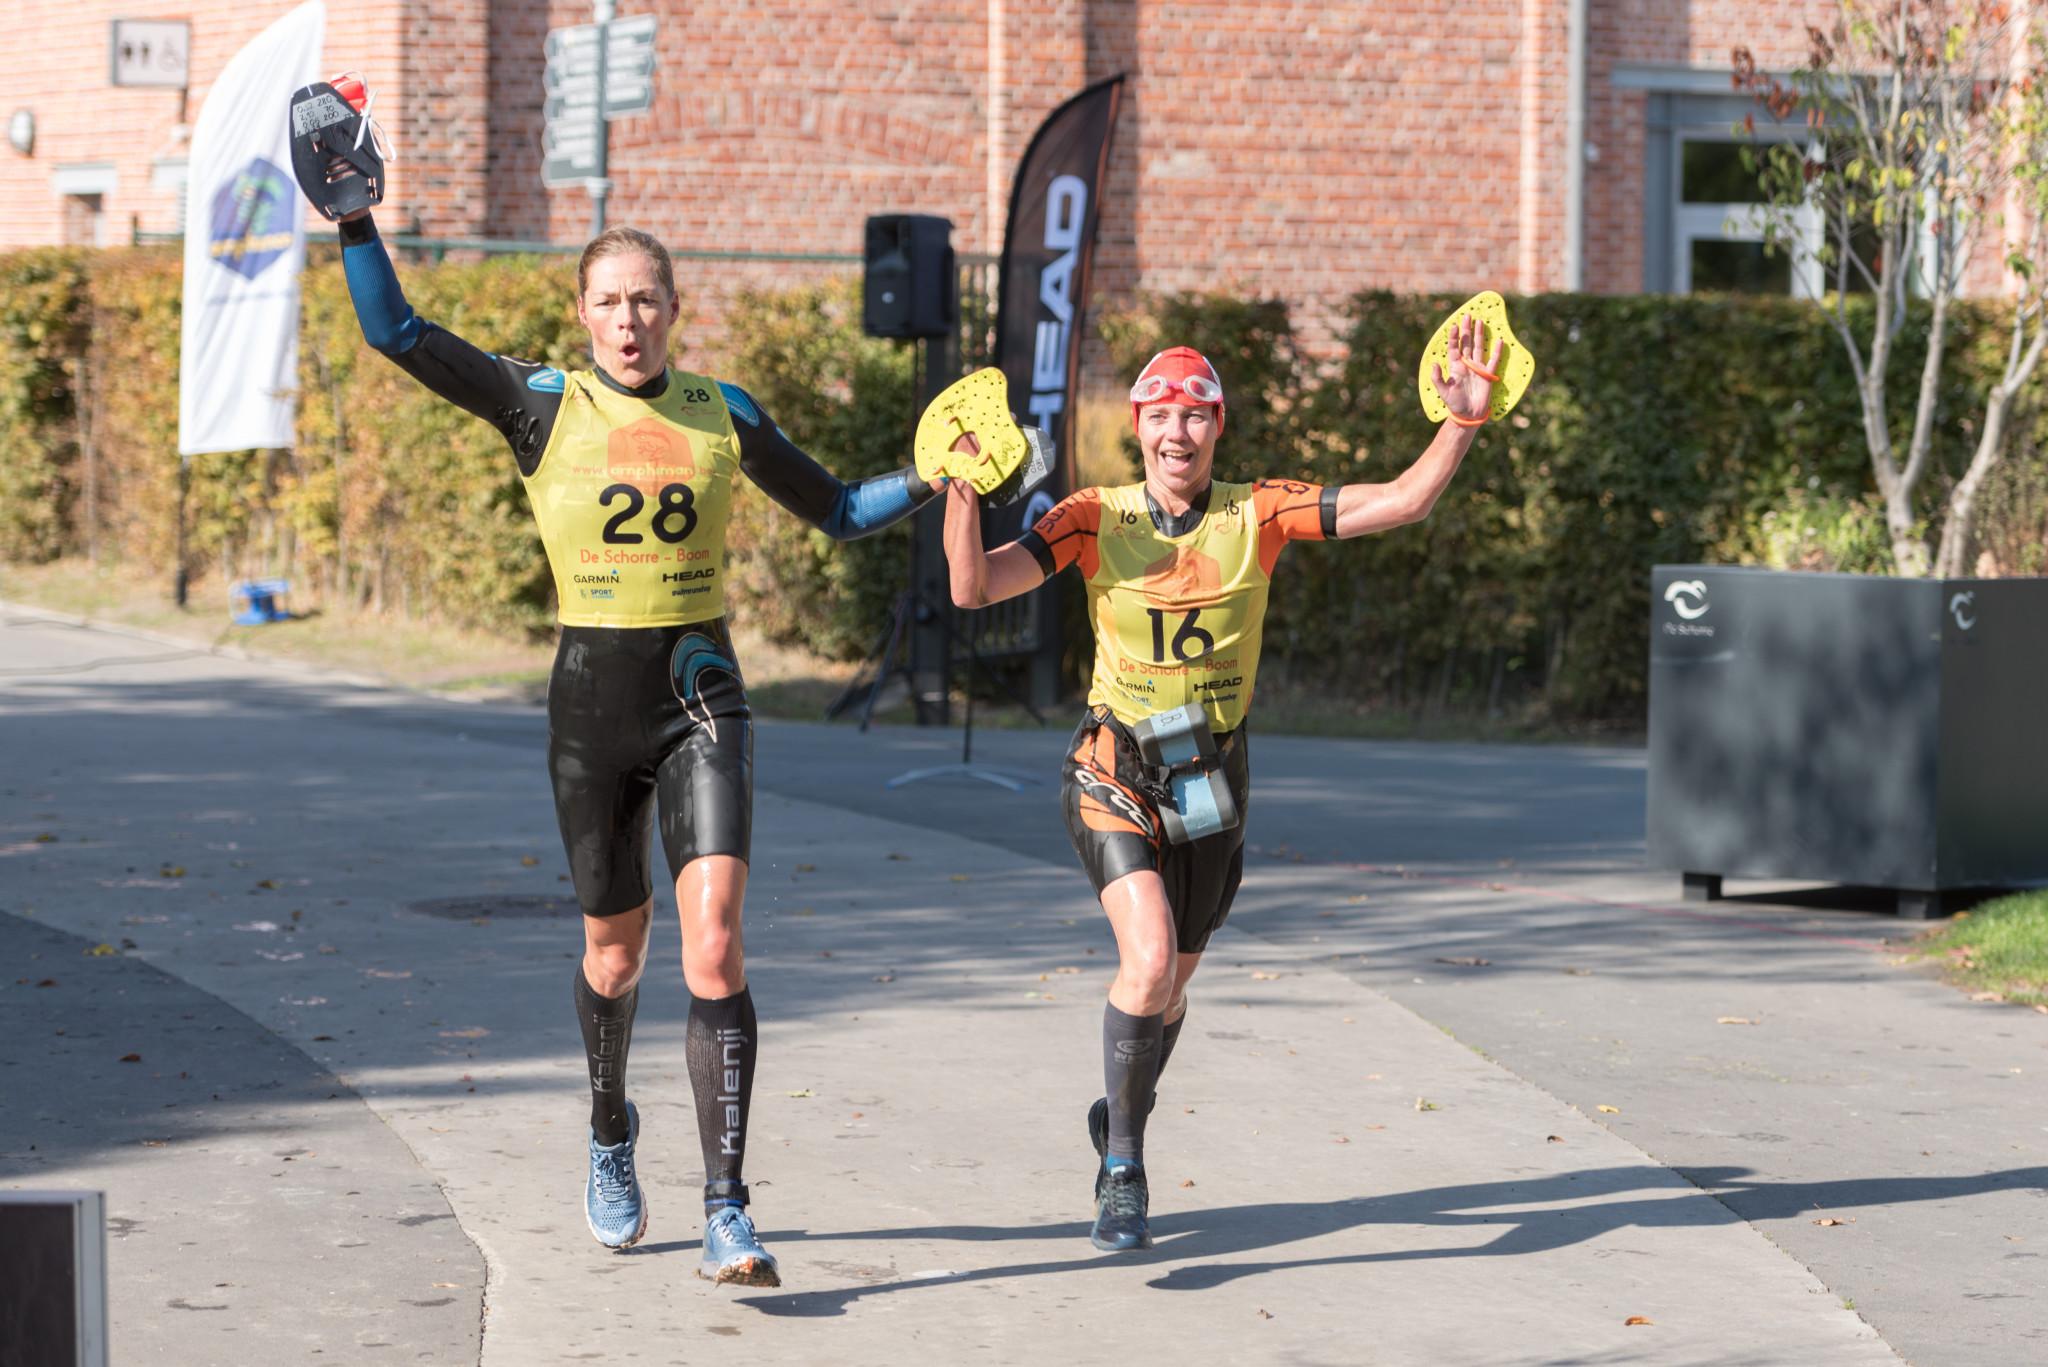 Janne Van Hove en Conny Bylois samen naar de streep (foto: 3athlon.be/Johan Tack)